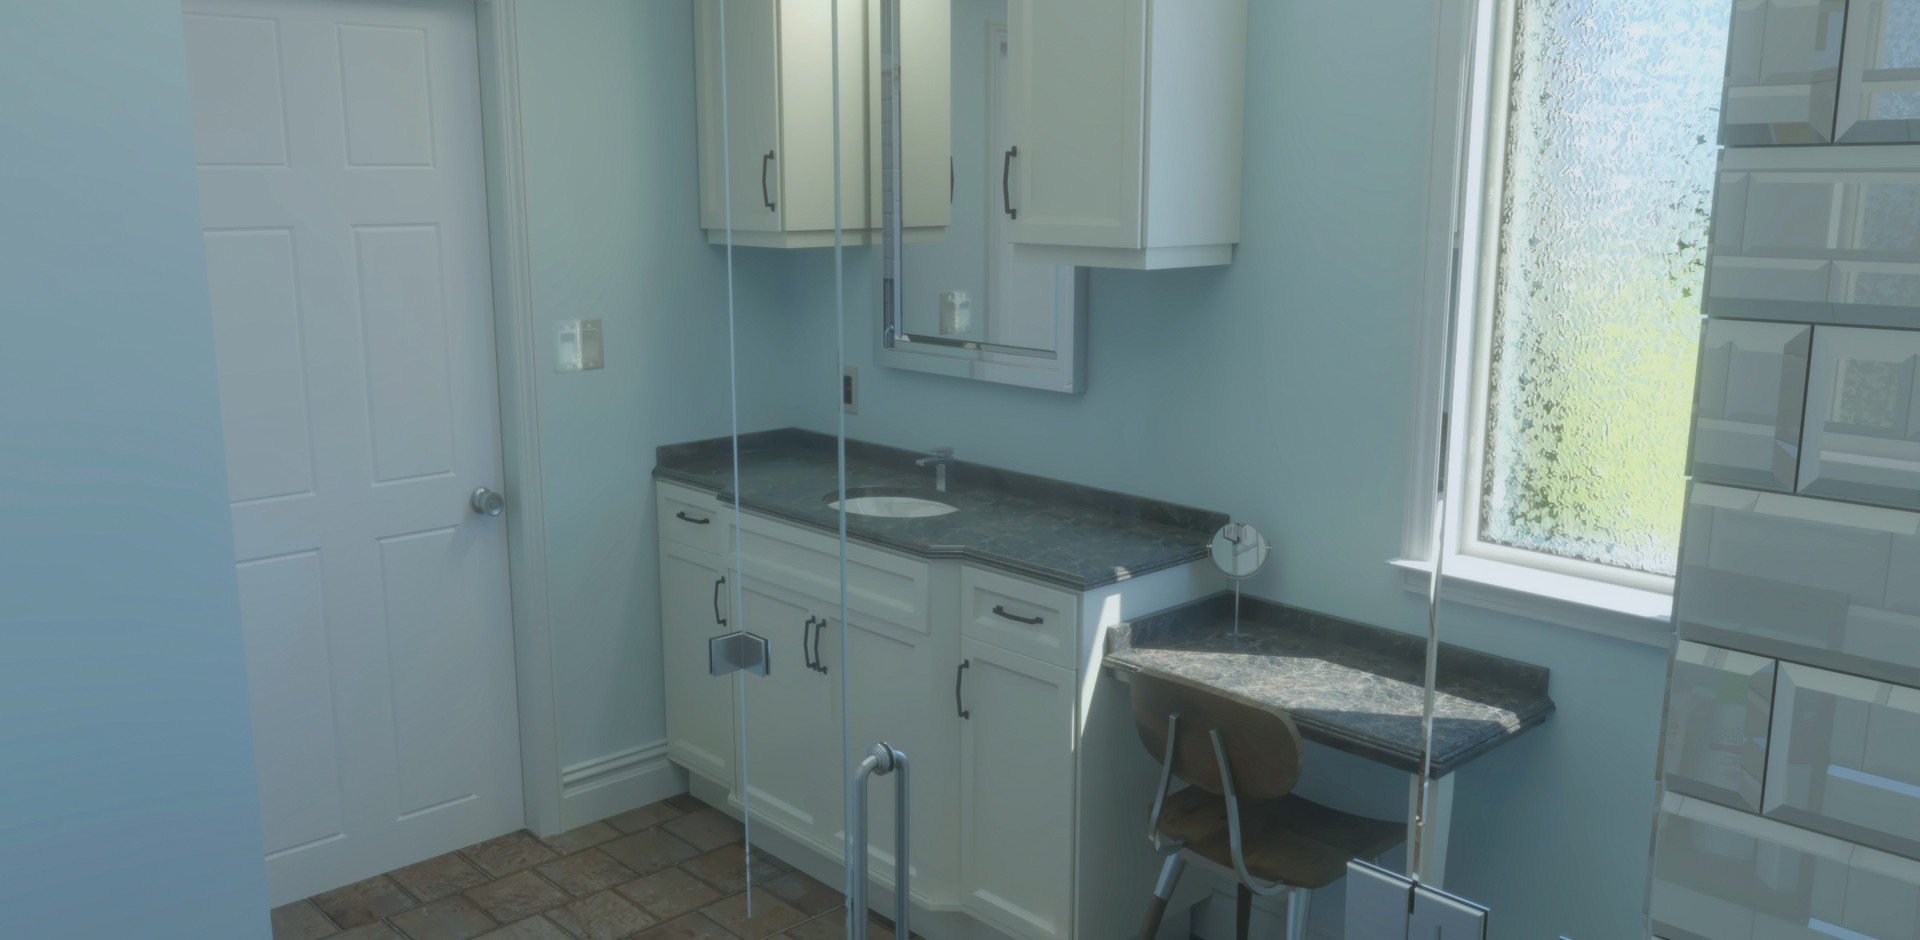 House Addition - Interior - Bath Room